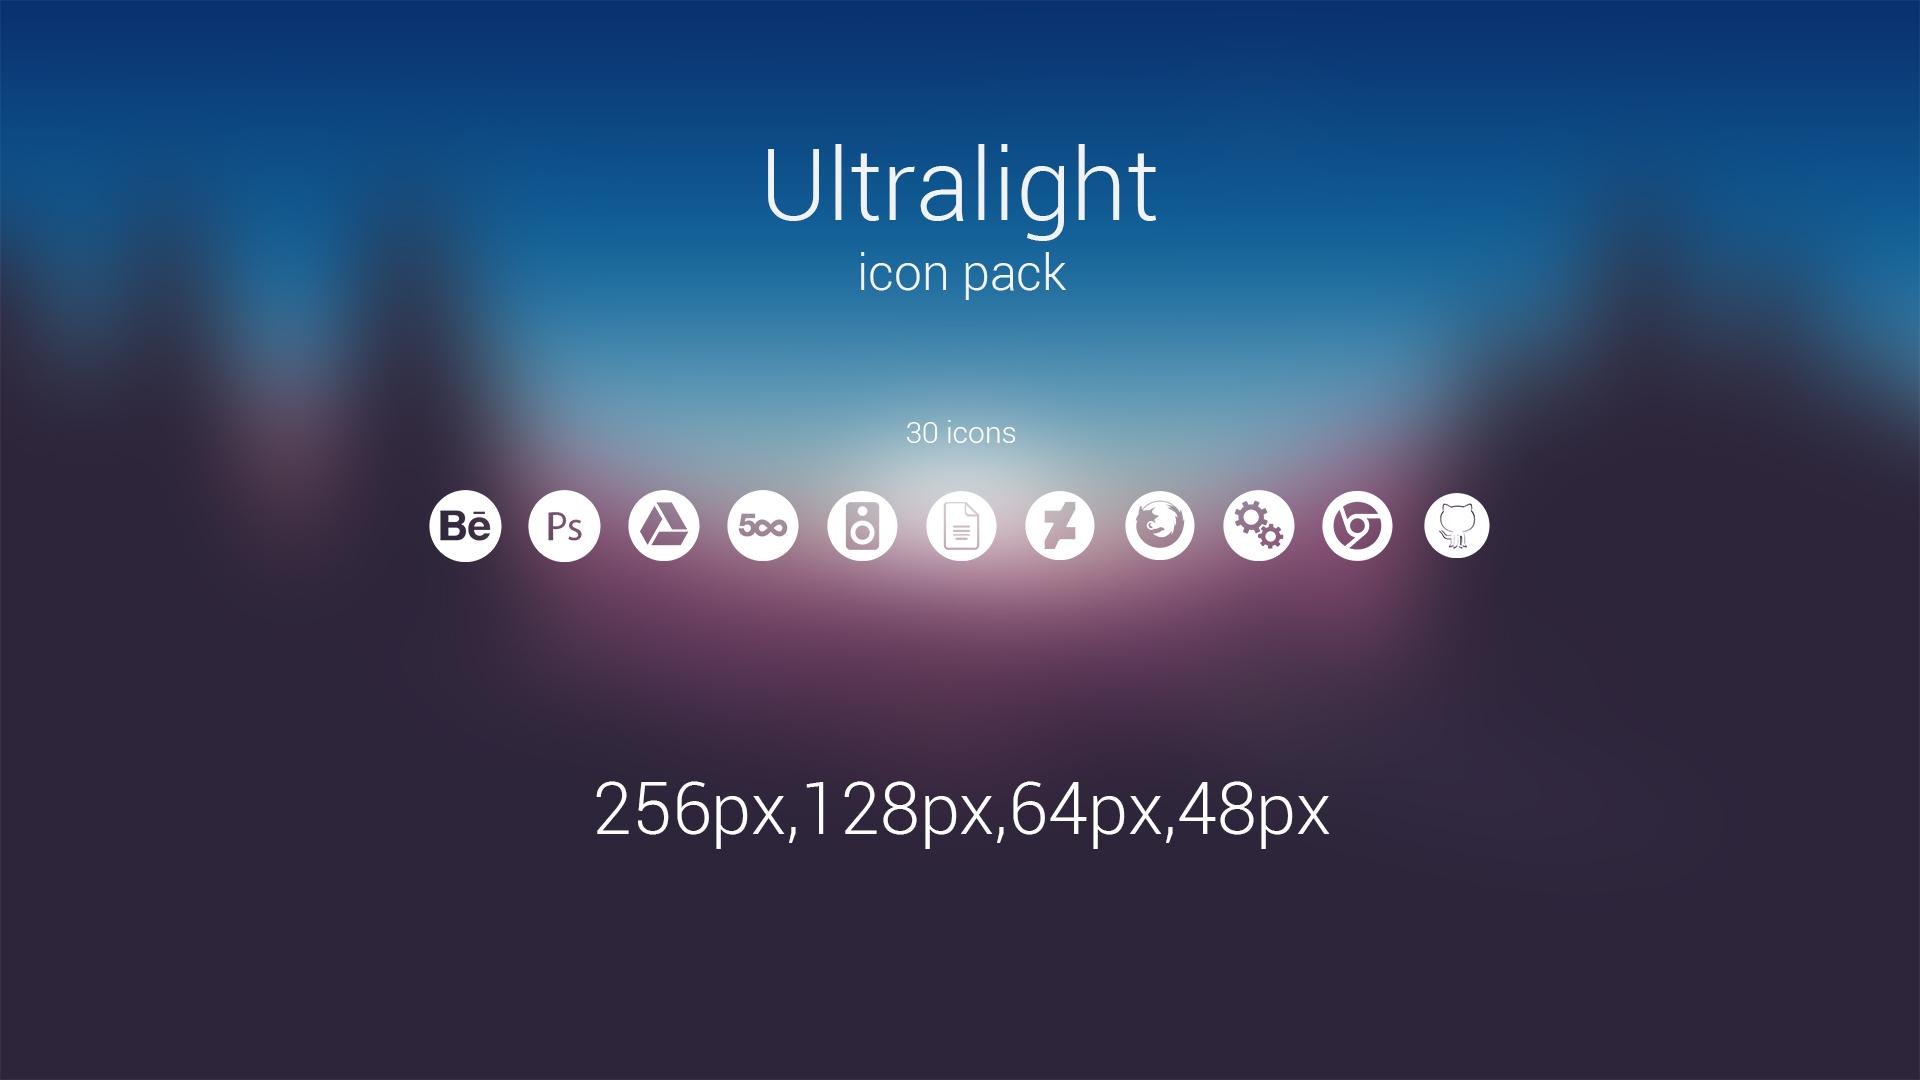 Ultralight icons